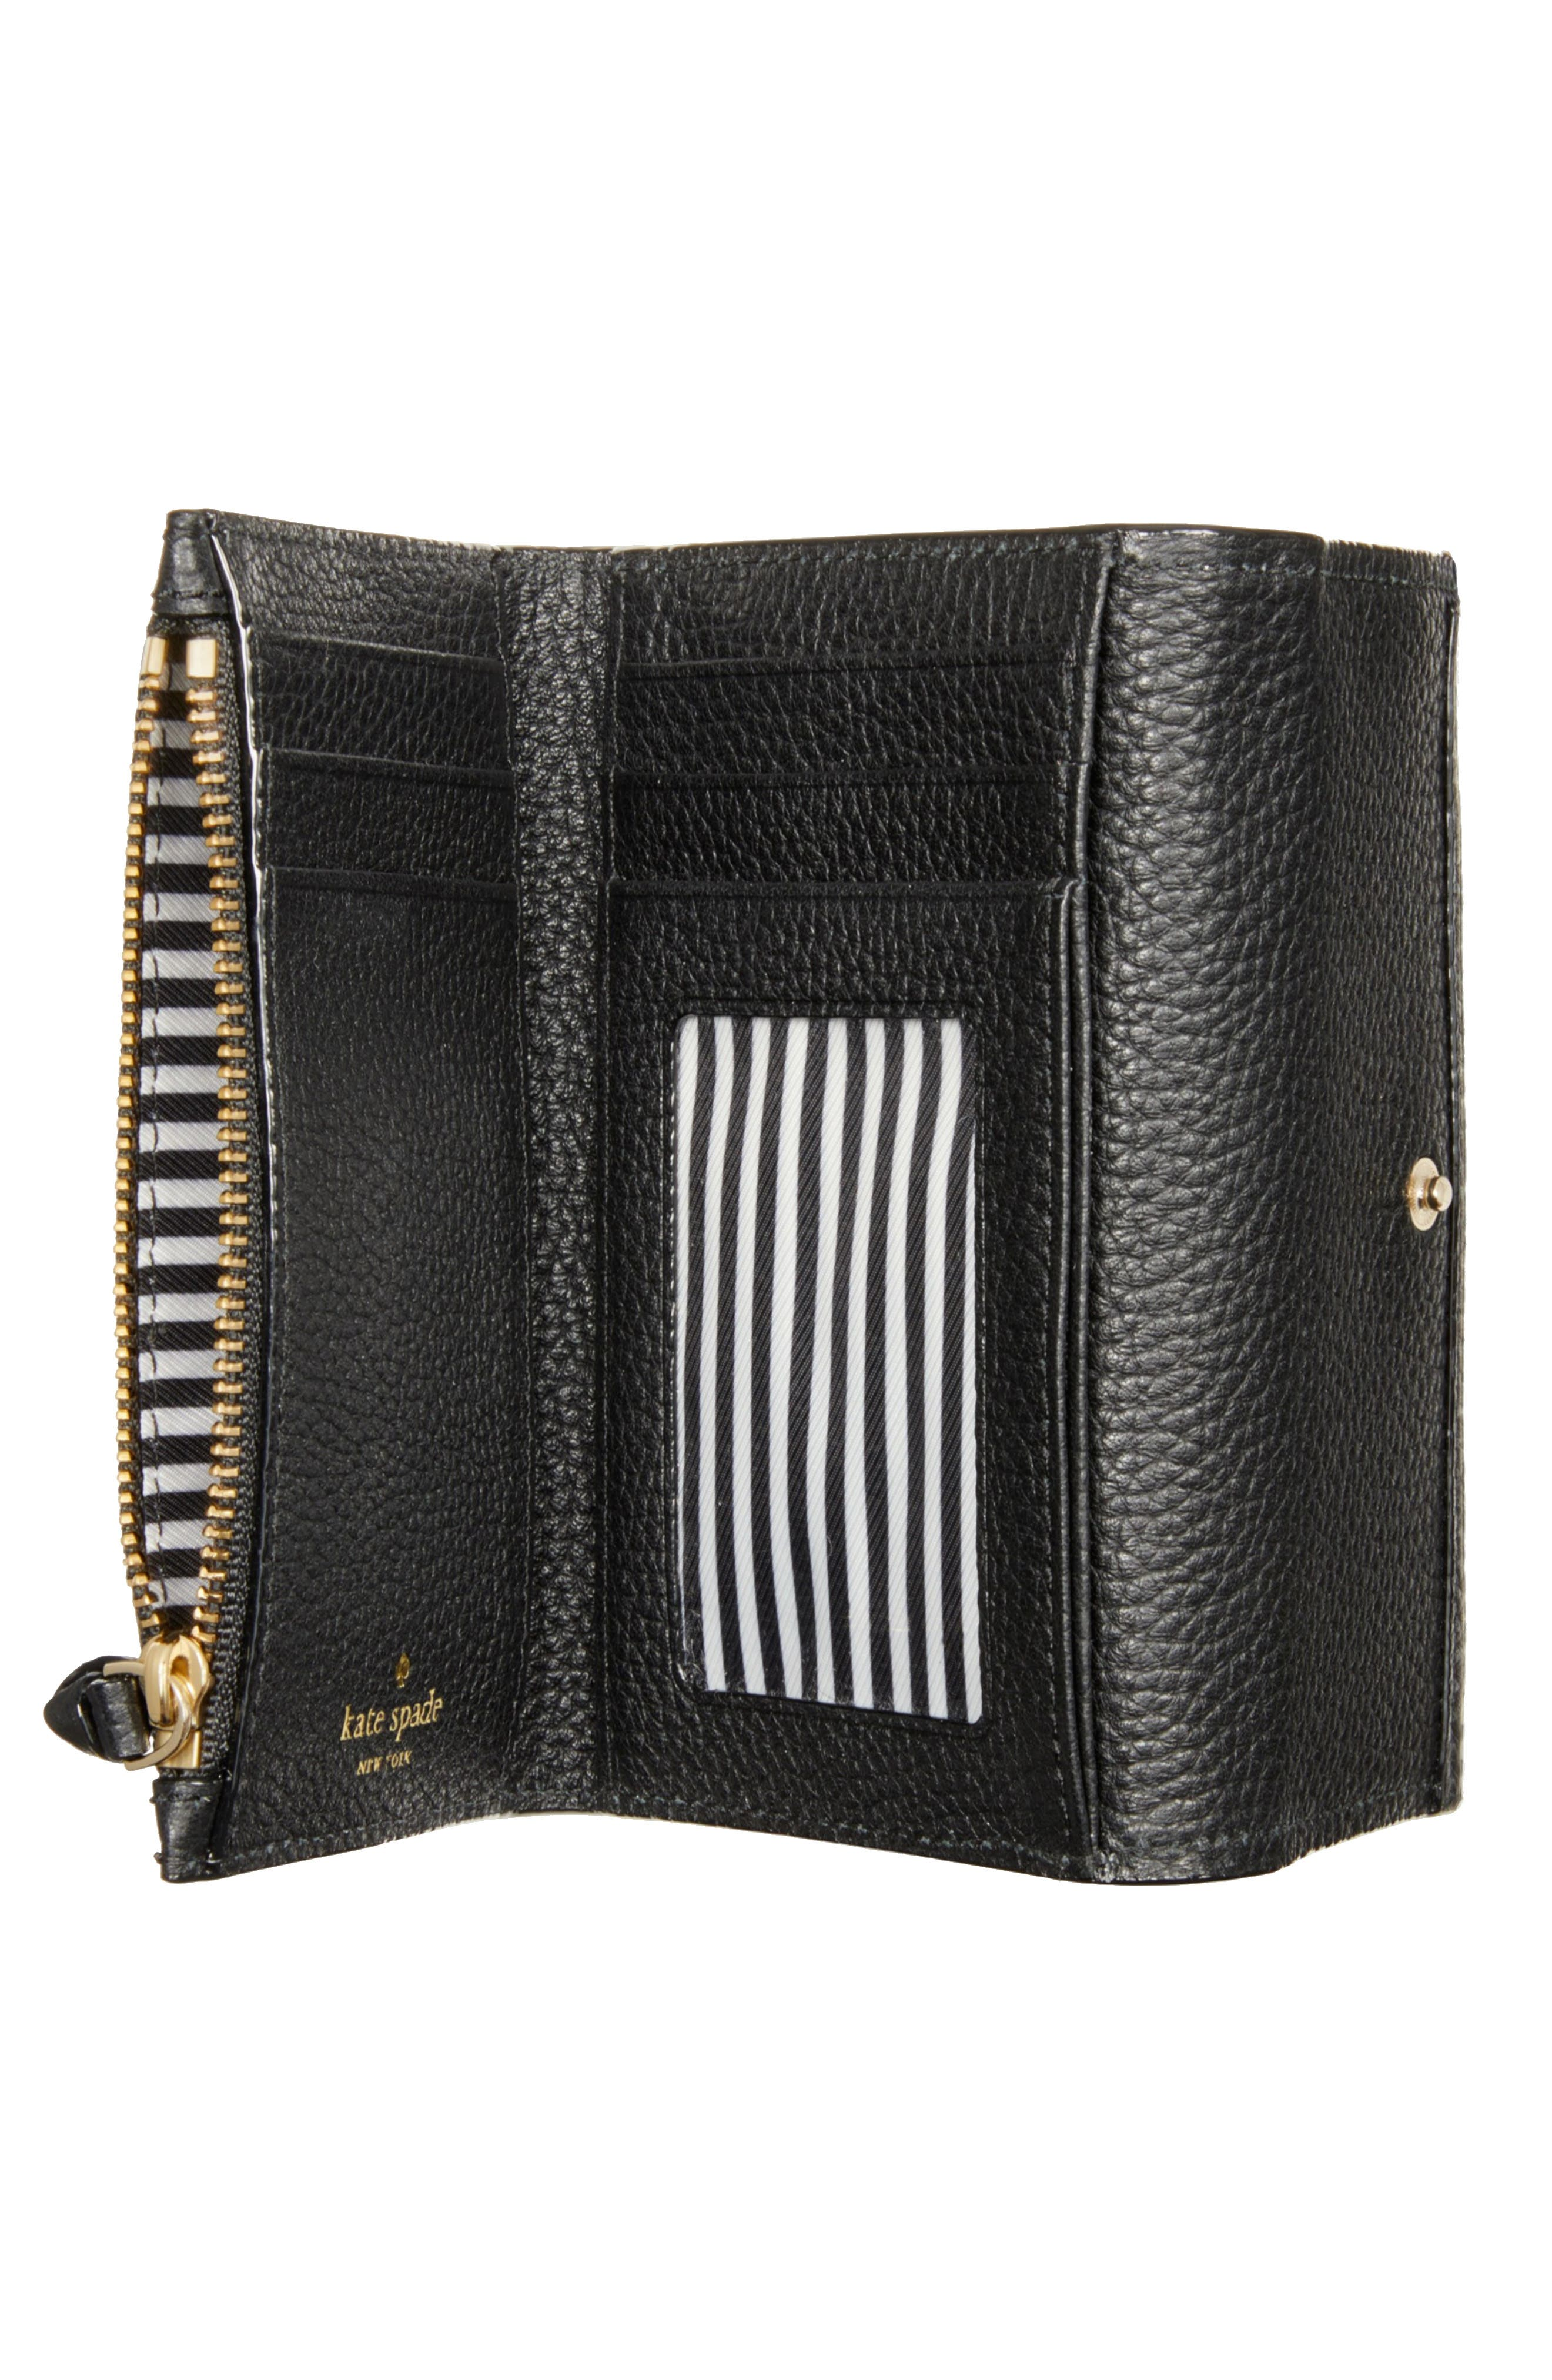 KATE SPADE NEW YORK, jackson street – meredith leather wallet, Alternate thumbnail 2, color, 001